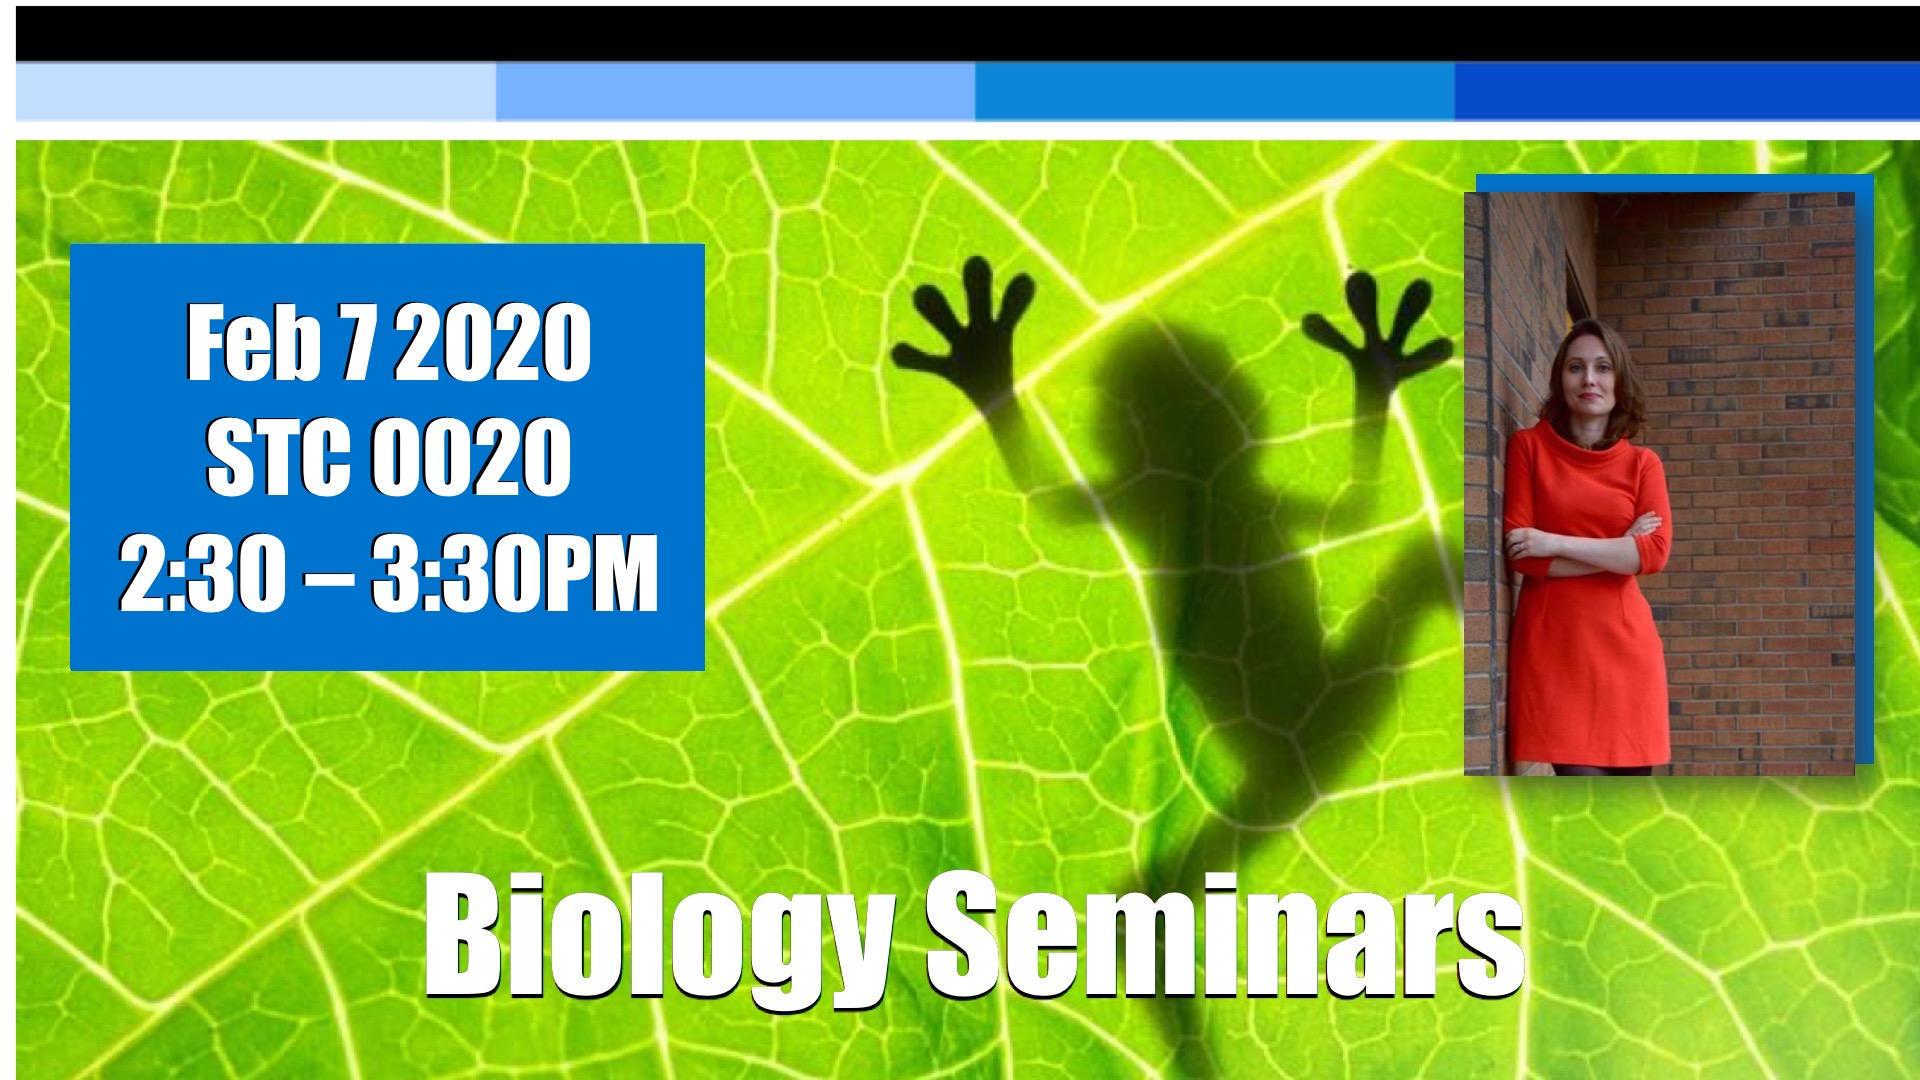 Biology seminar advertisement.